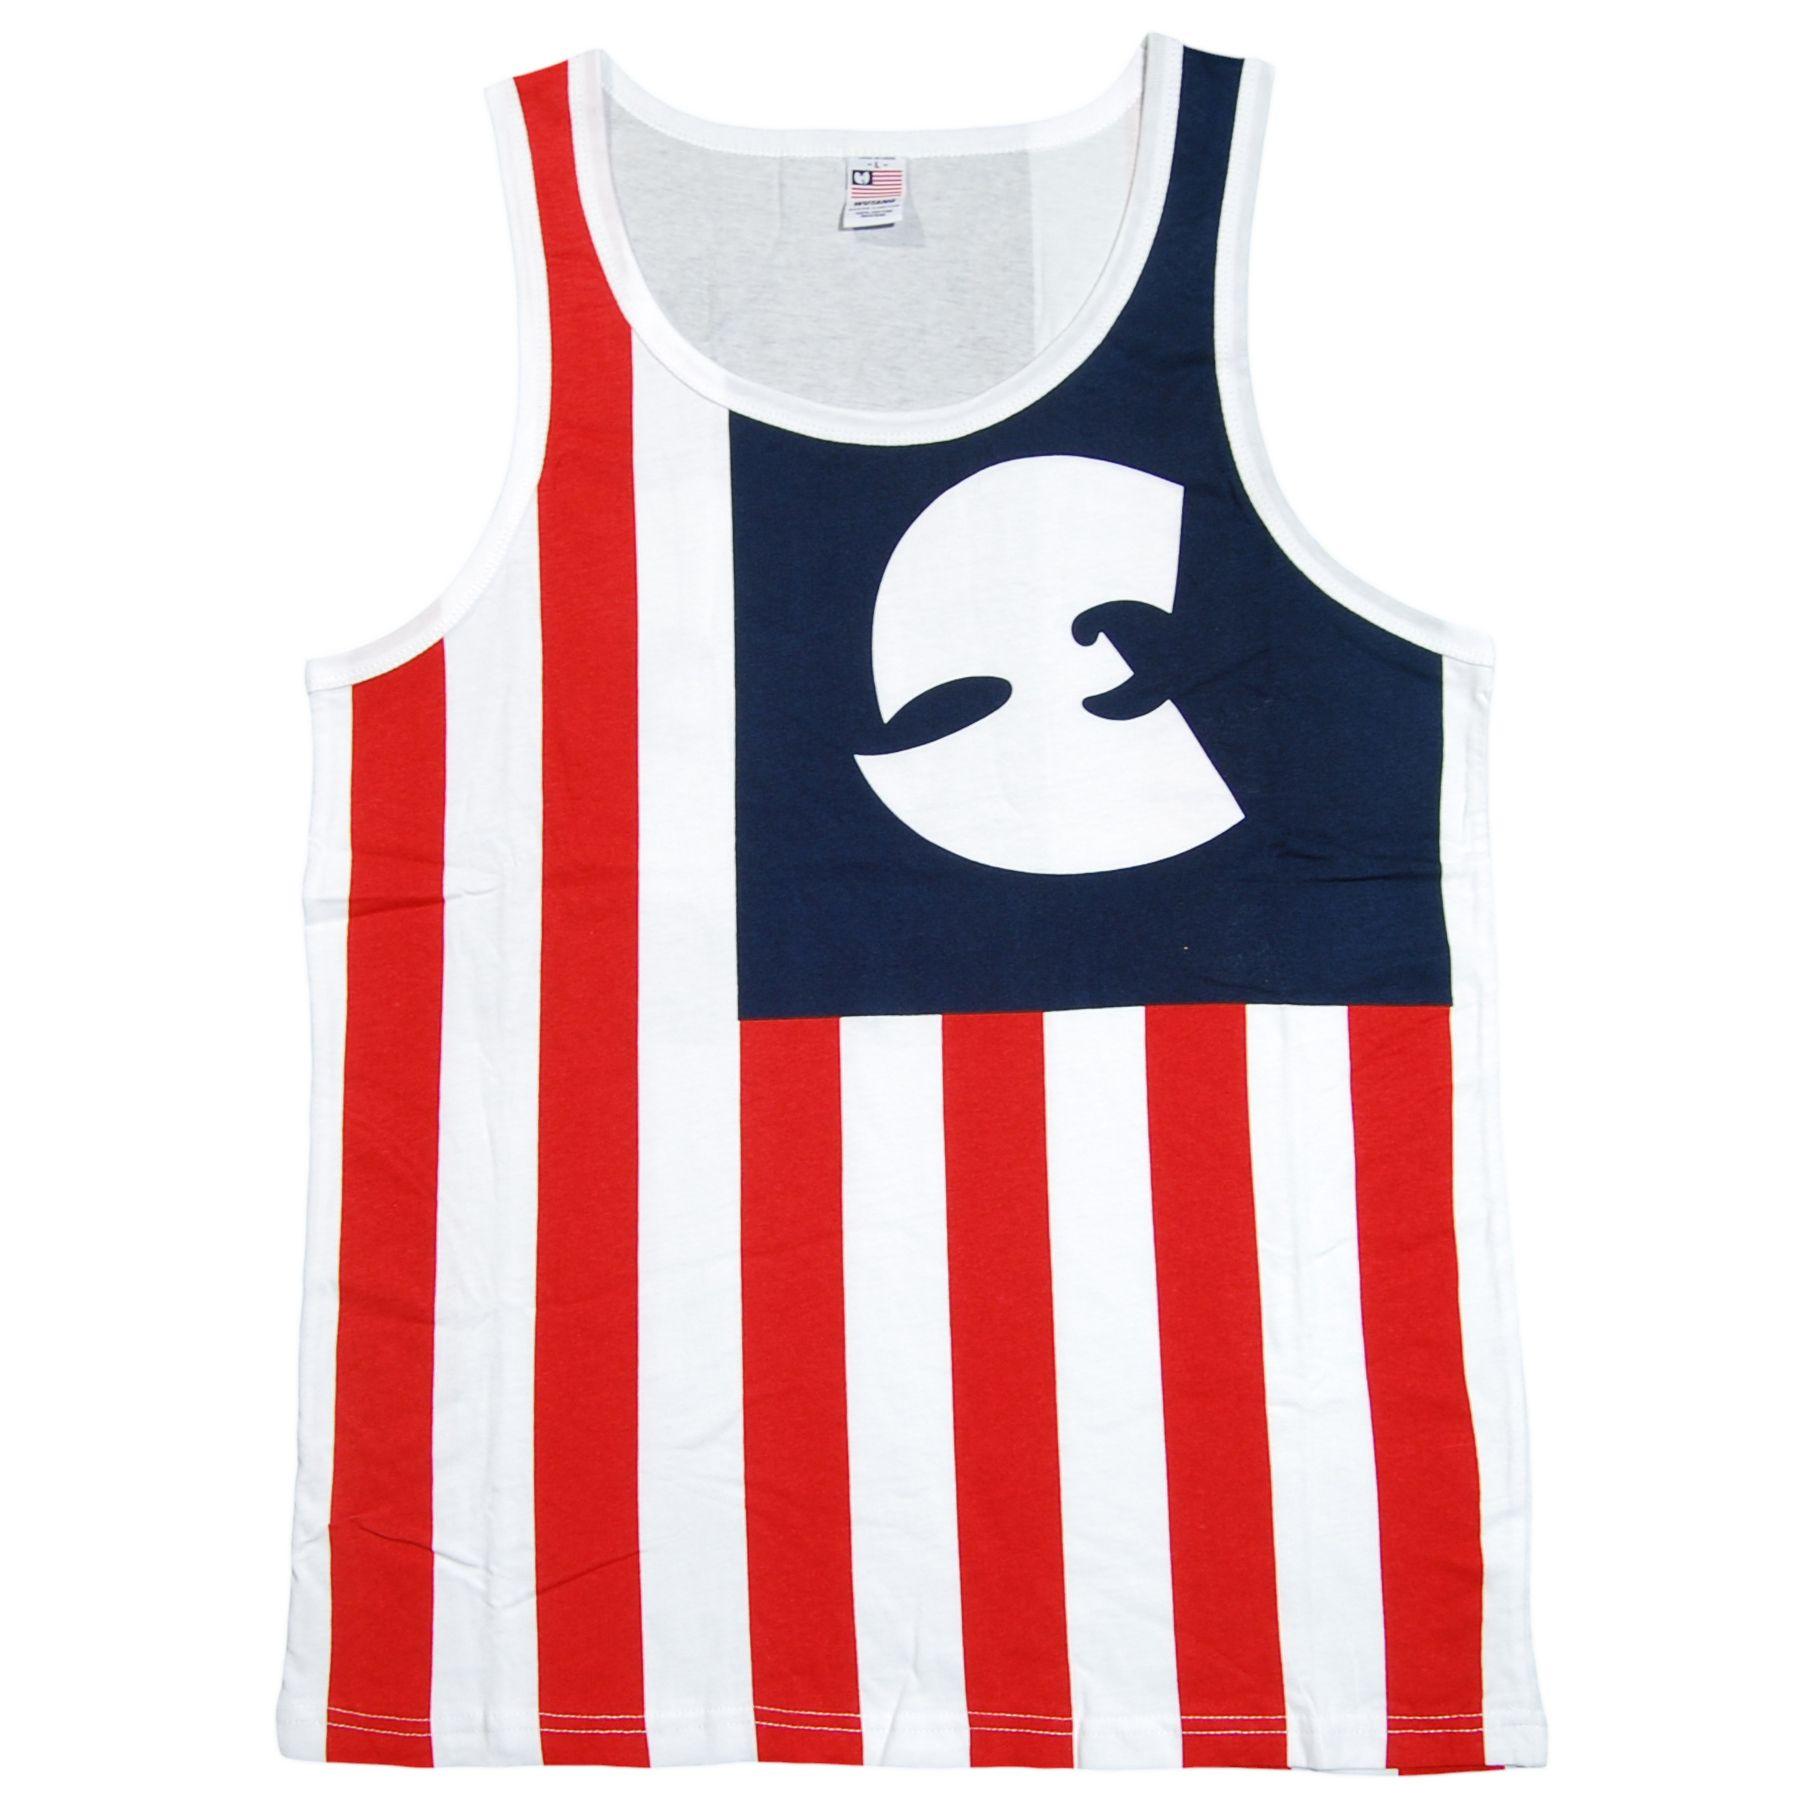 Meish Me Tees Custom T Shirt Printing Toronto Joe Maloy